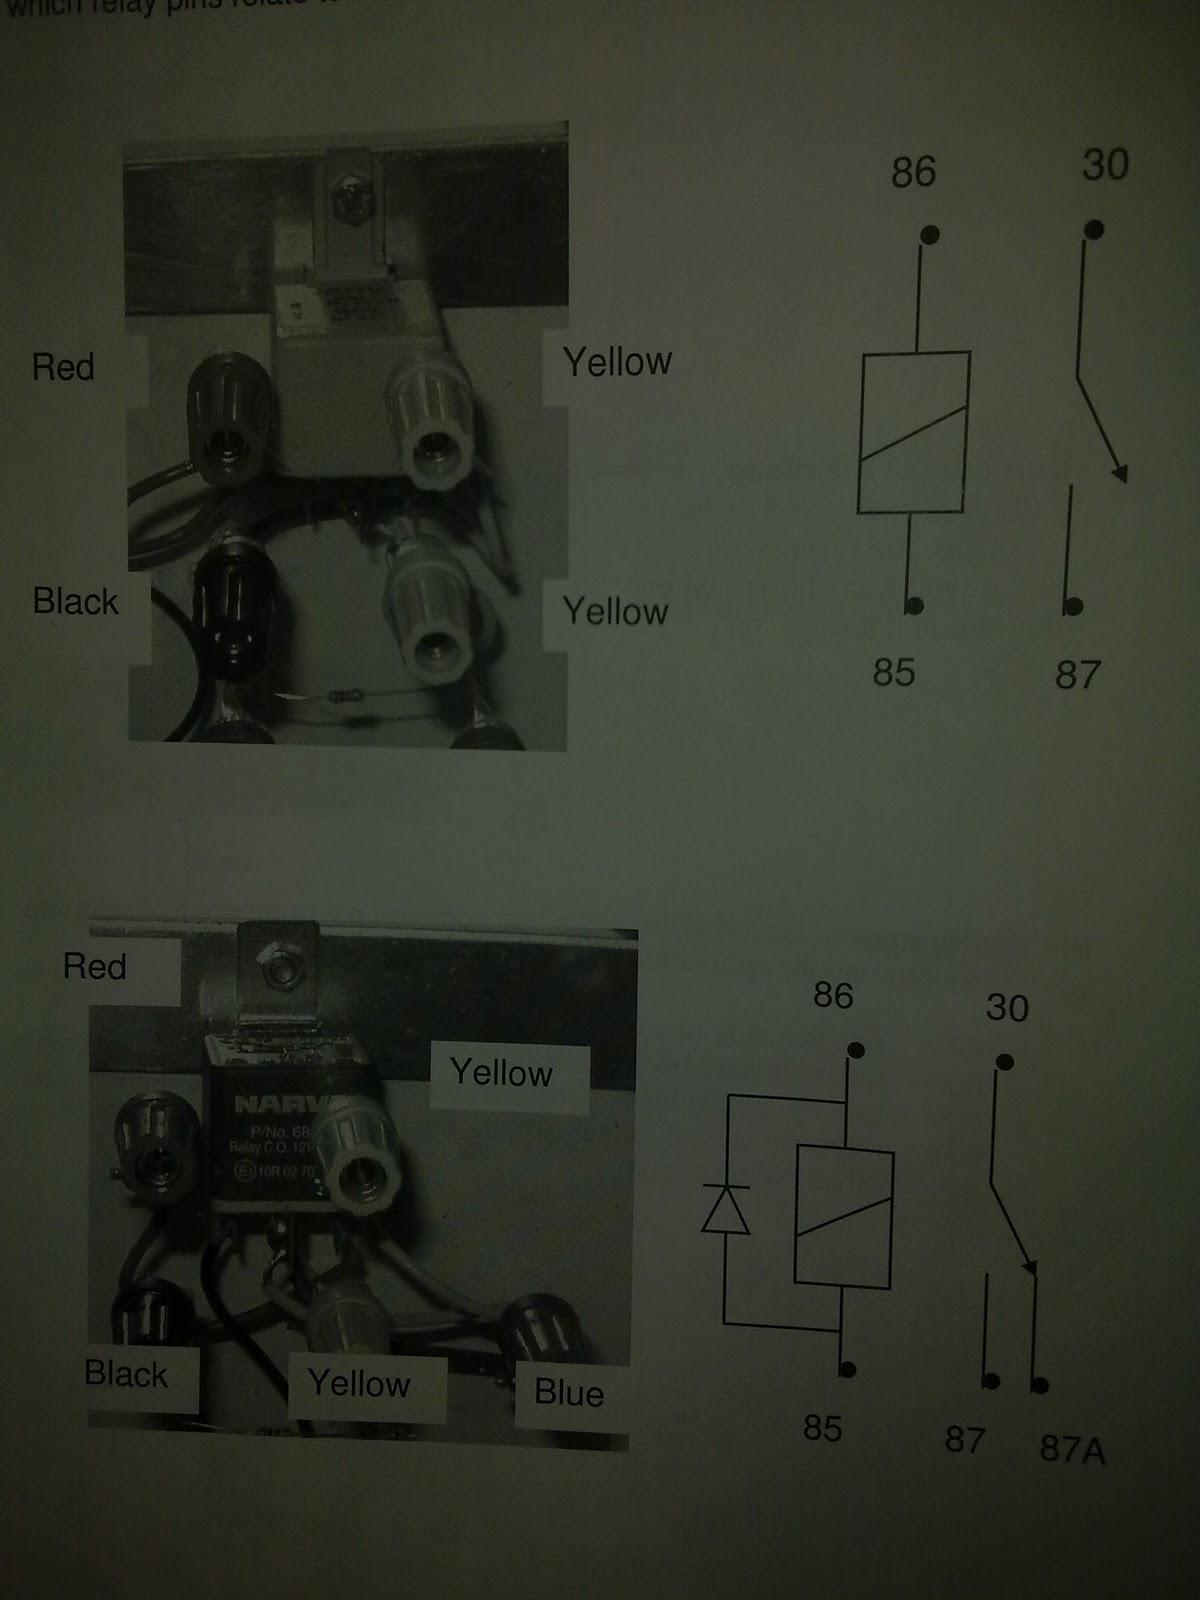 Electrical Relay Designations